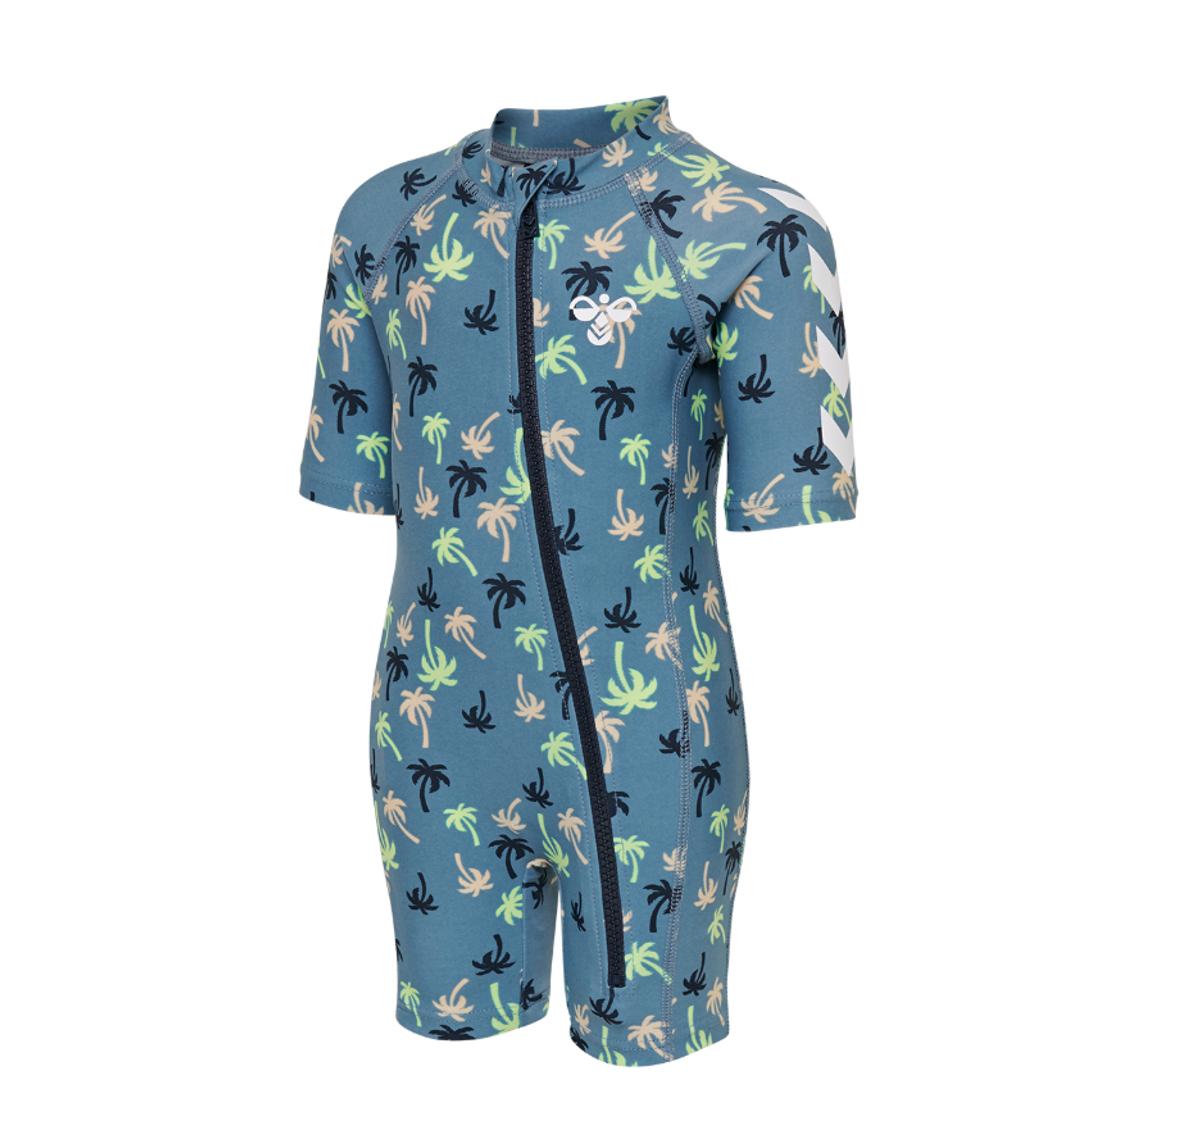 Blå Mønstrete Hummel Beach Swimsuit